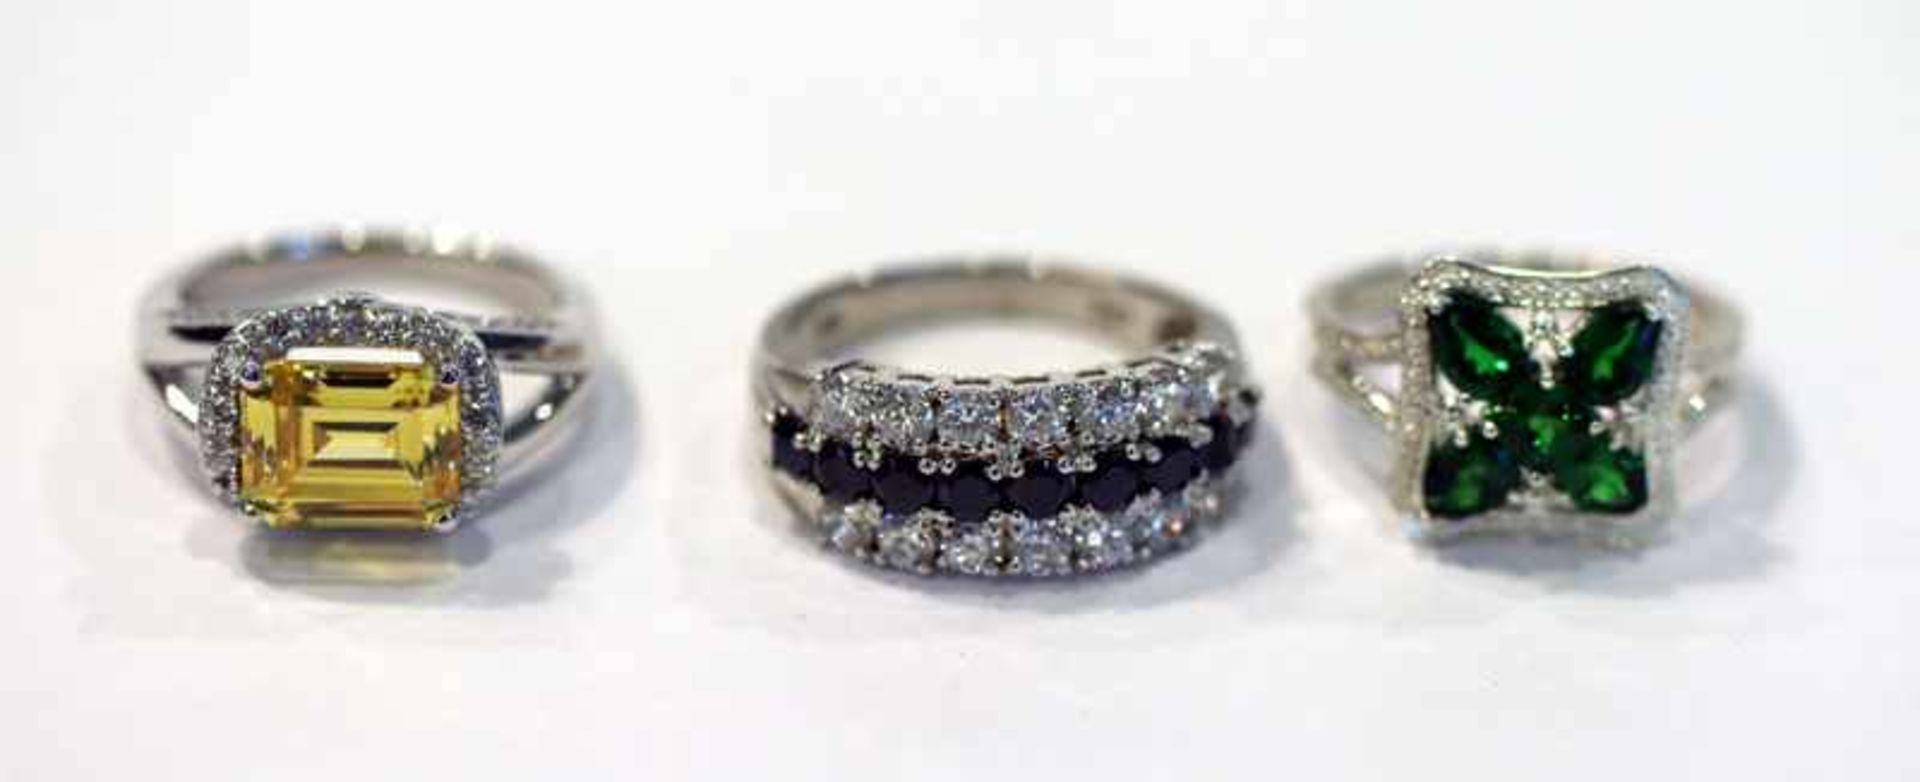 Los 2 - 3 dekorative Sterlingsilber Ringe mit farbigen Glassteinen, Gr. 57/59